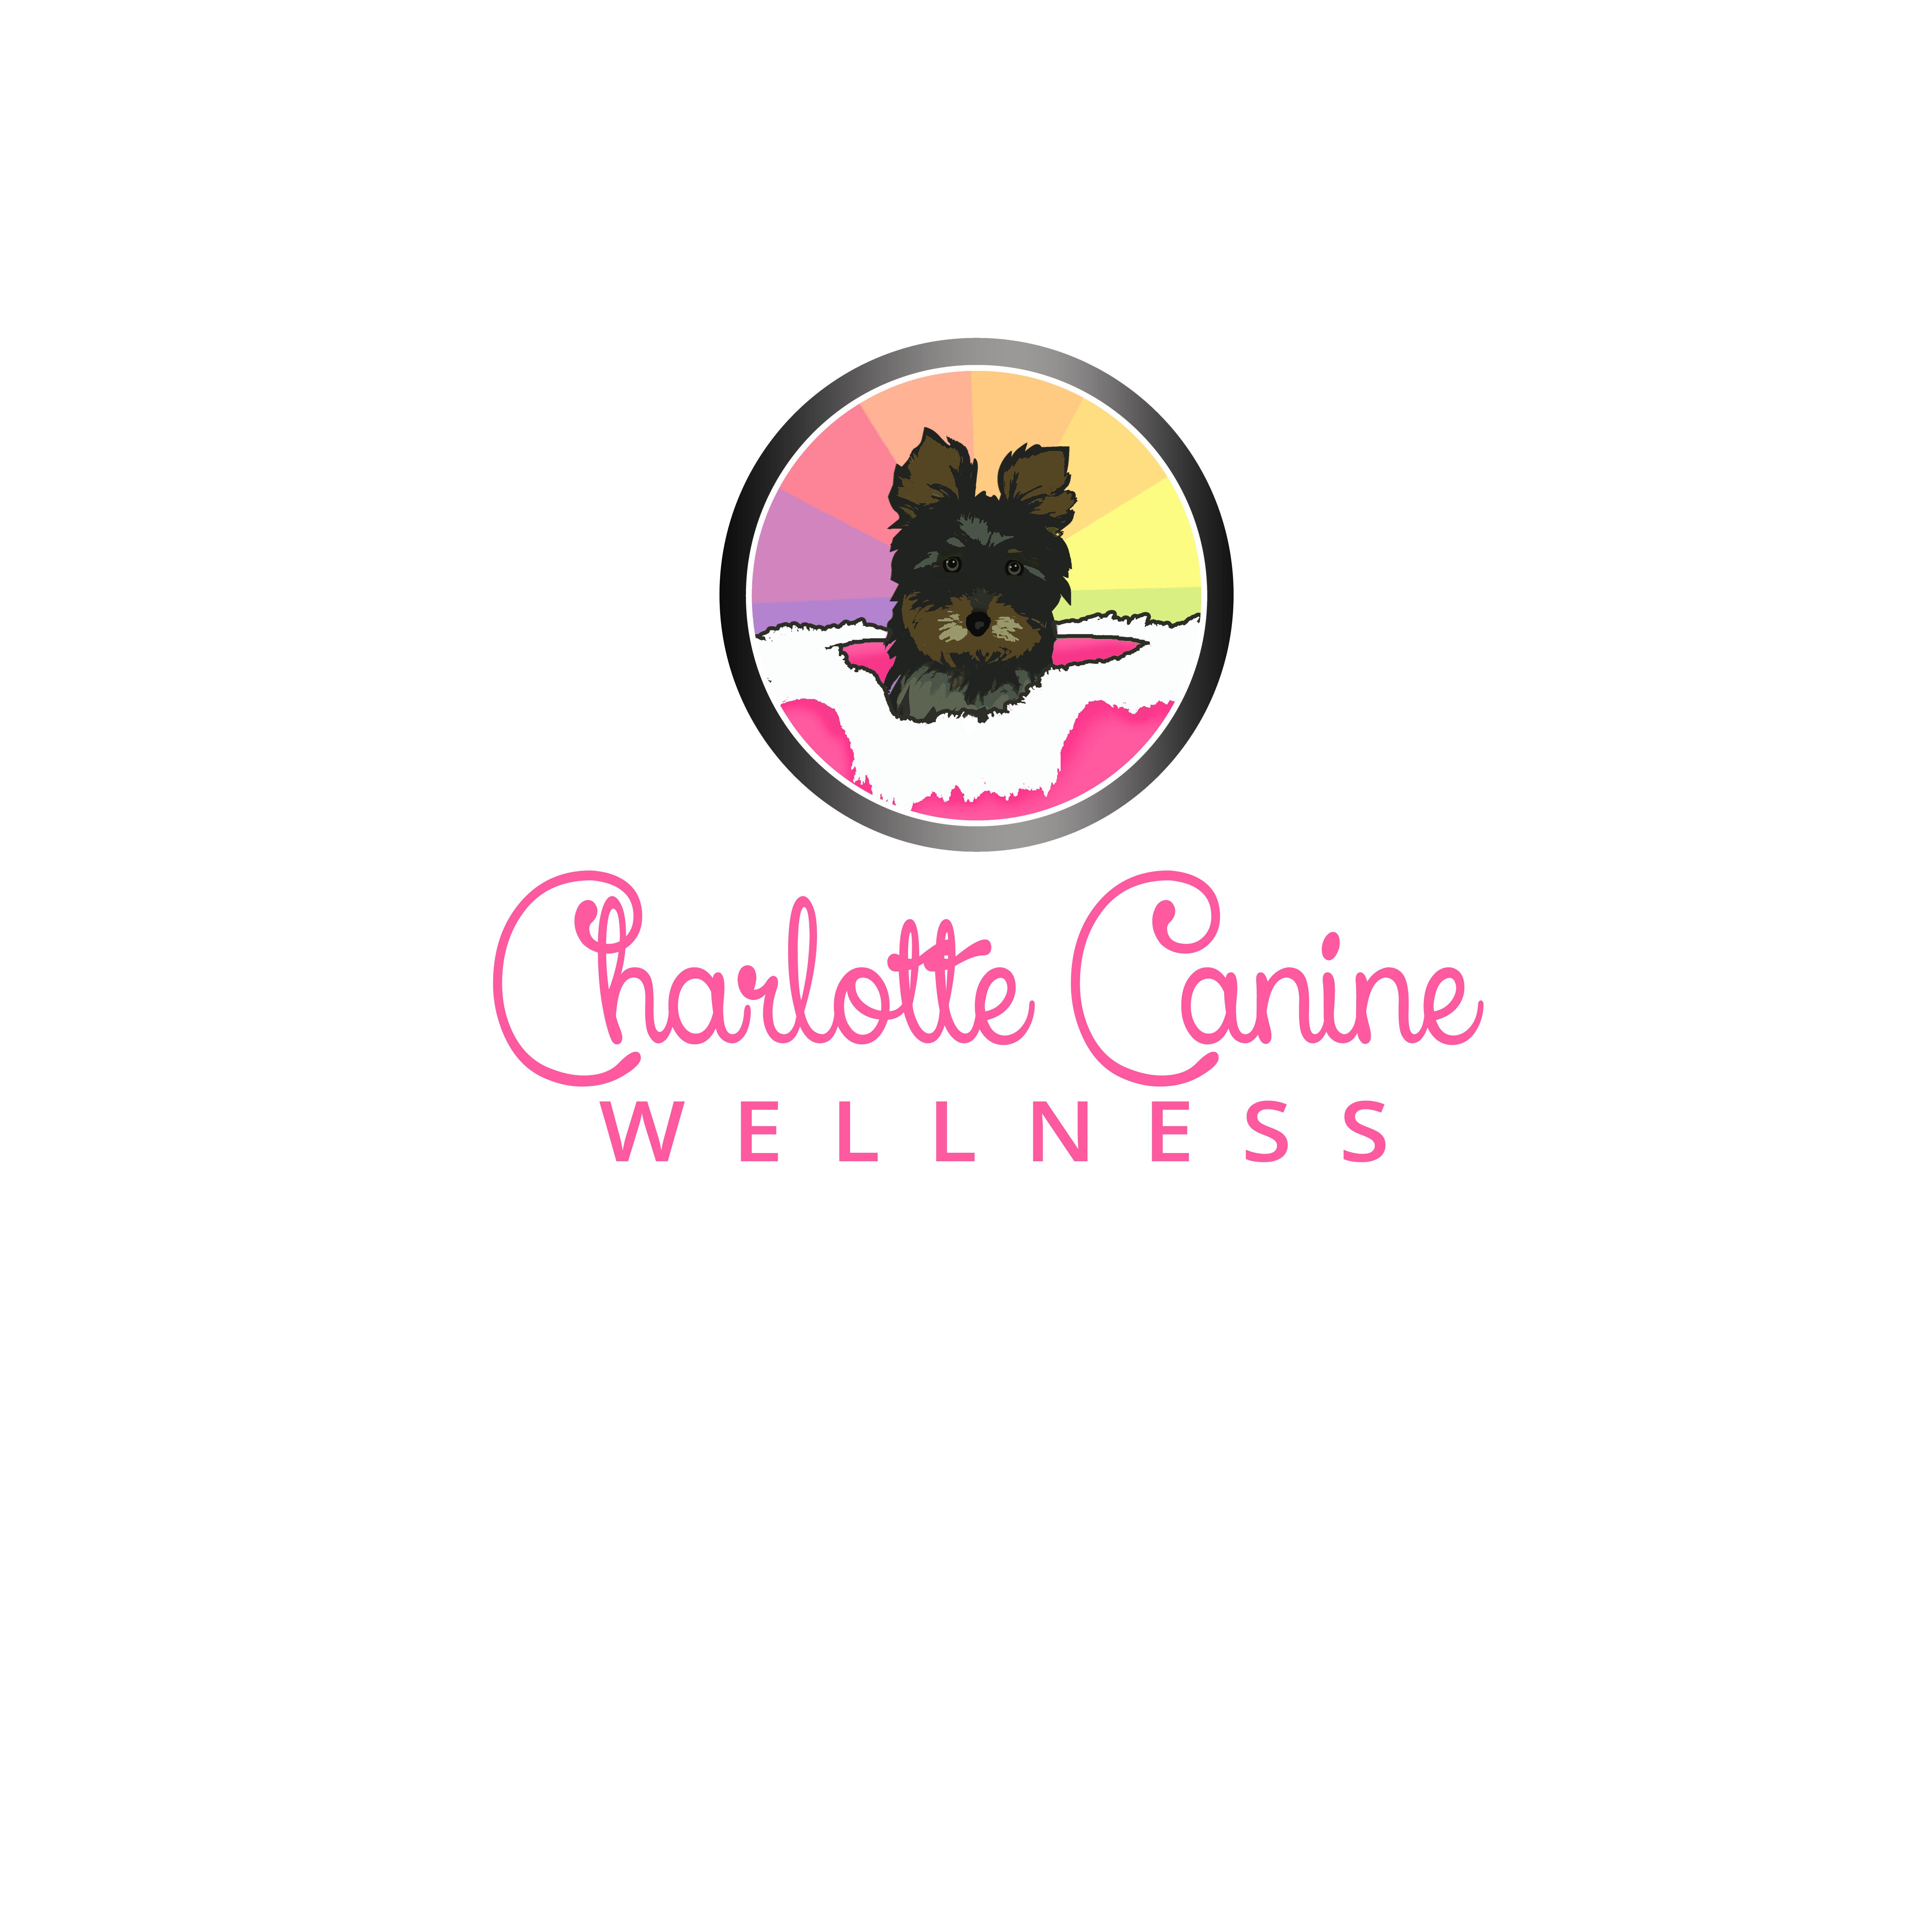 Logo Design by Allan Esclamado - Entry No. 100 in the Logo Design Contest New Logo Design for Charlotte Canine Wellness.